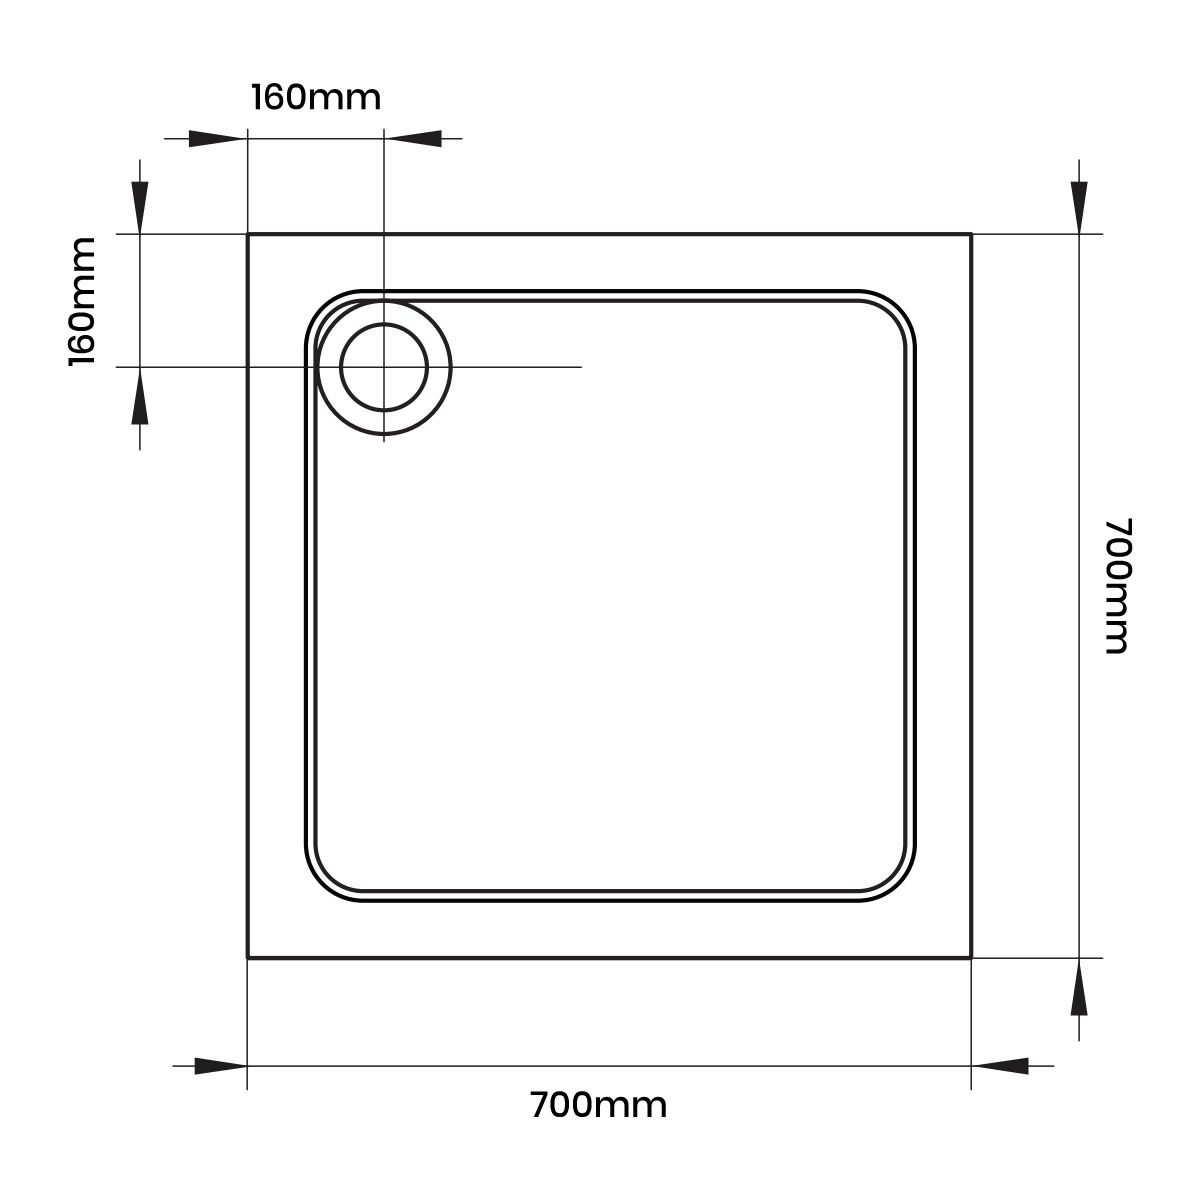 April Square Anti Slip Shower Tray 700 x 700 Line Drawing